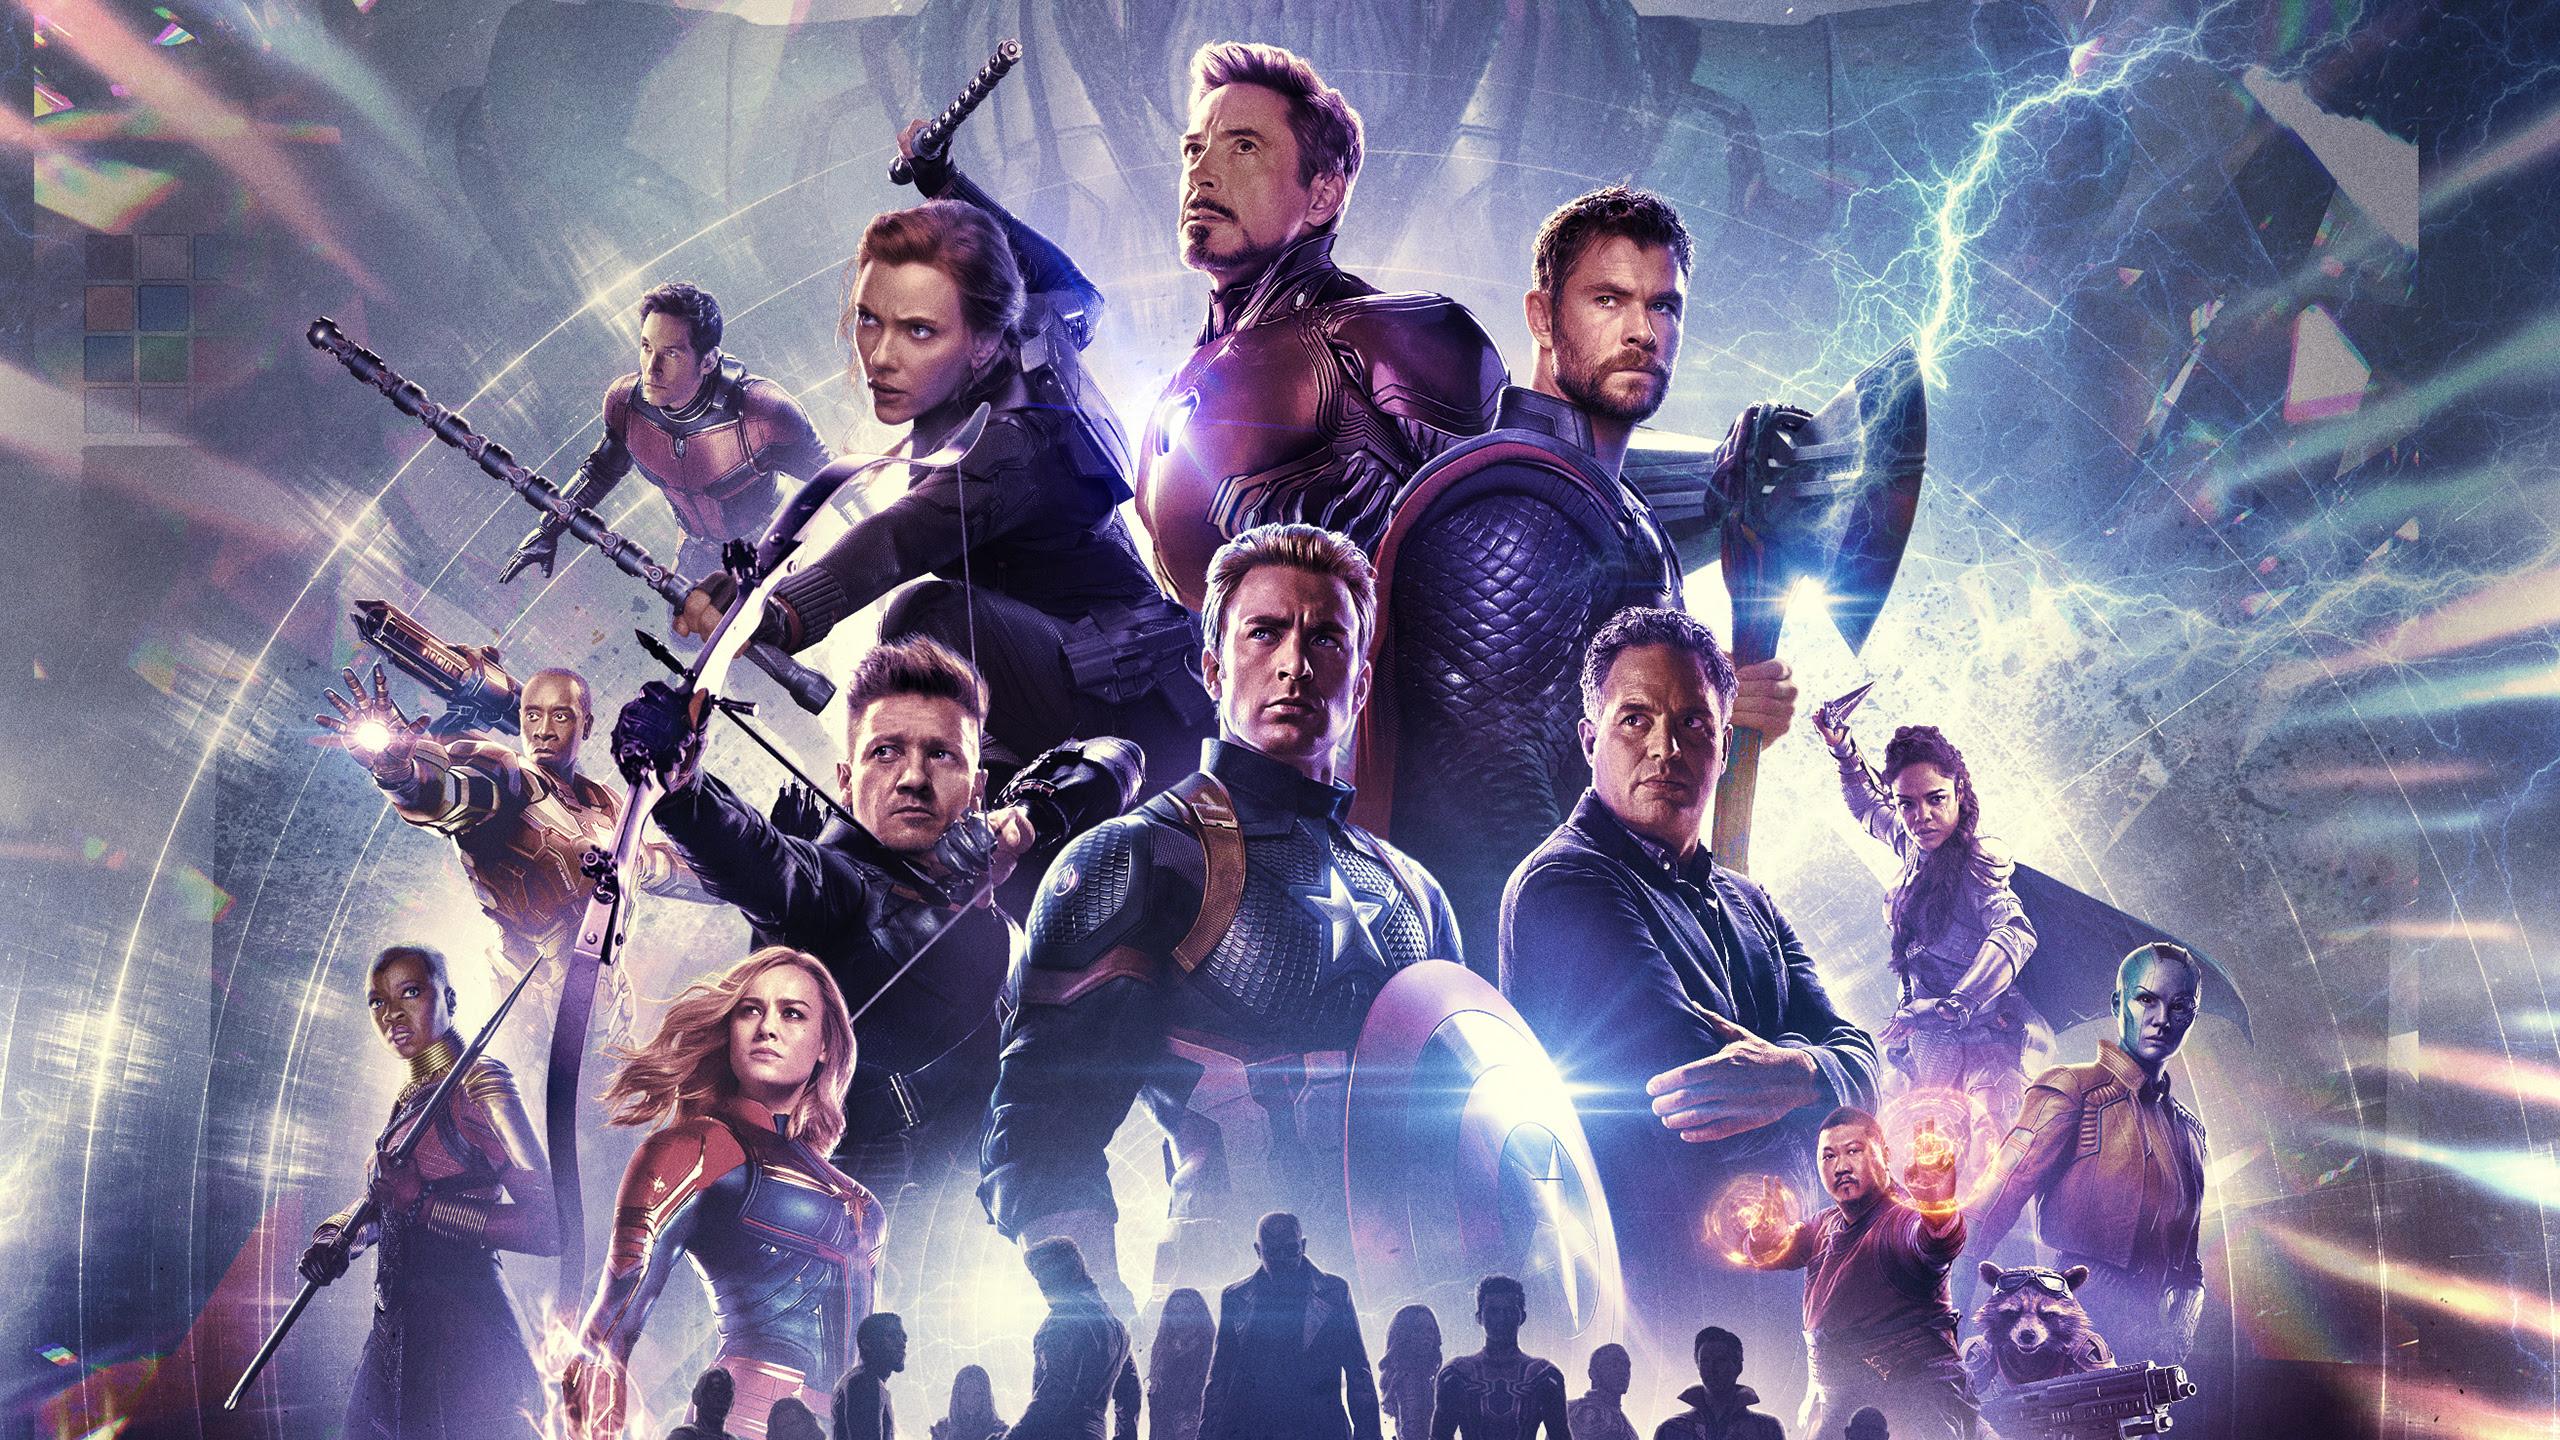 Avengers Endgame 2019 Wallpapers Hd Wallpapers